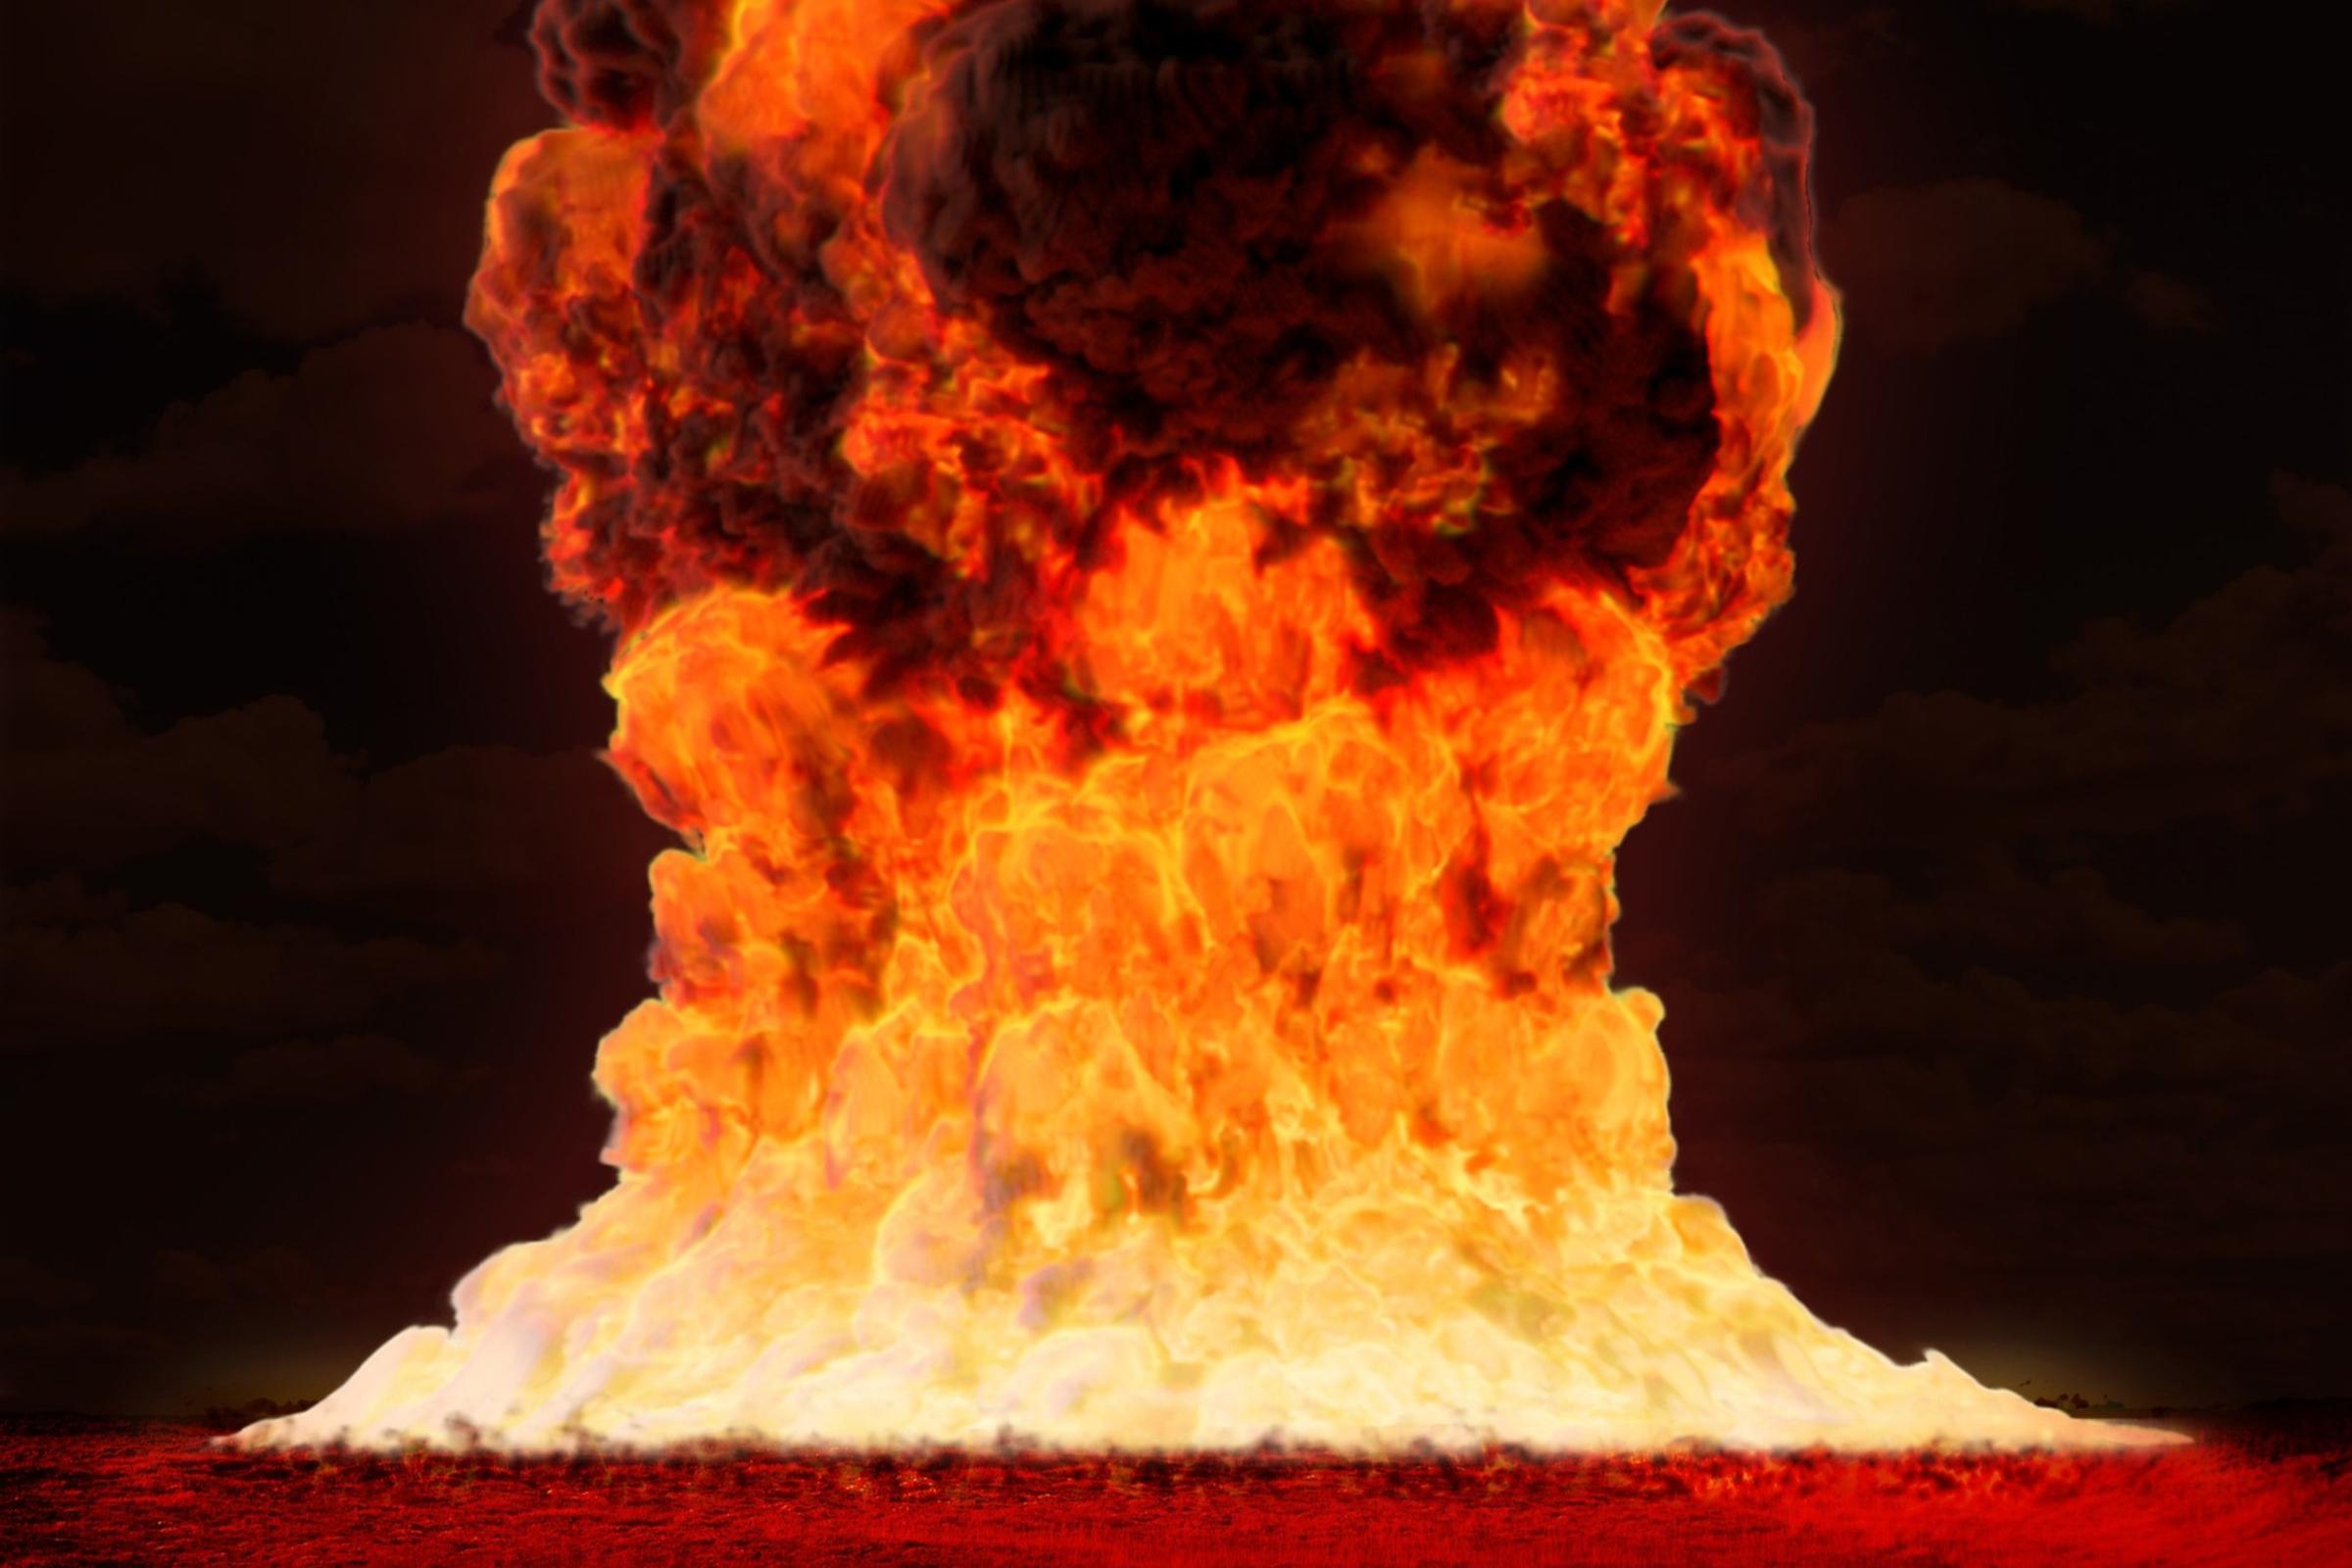 Car Air Freshener Explosion